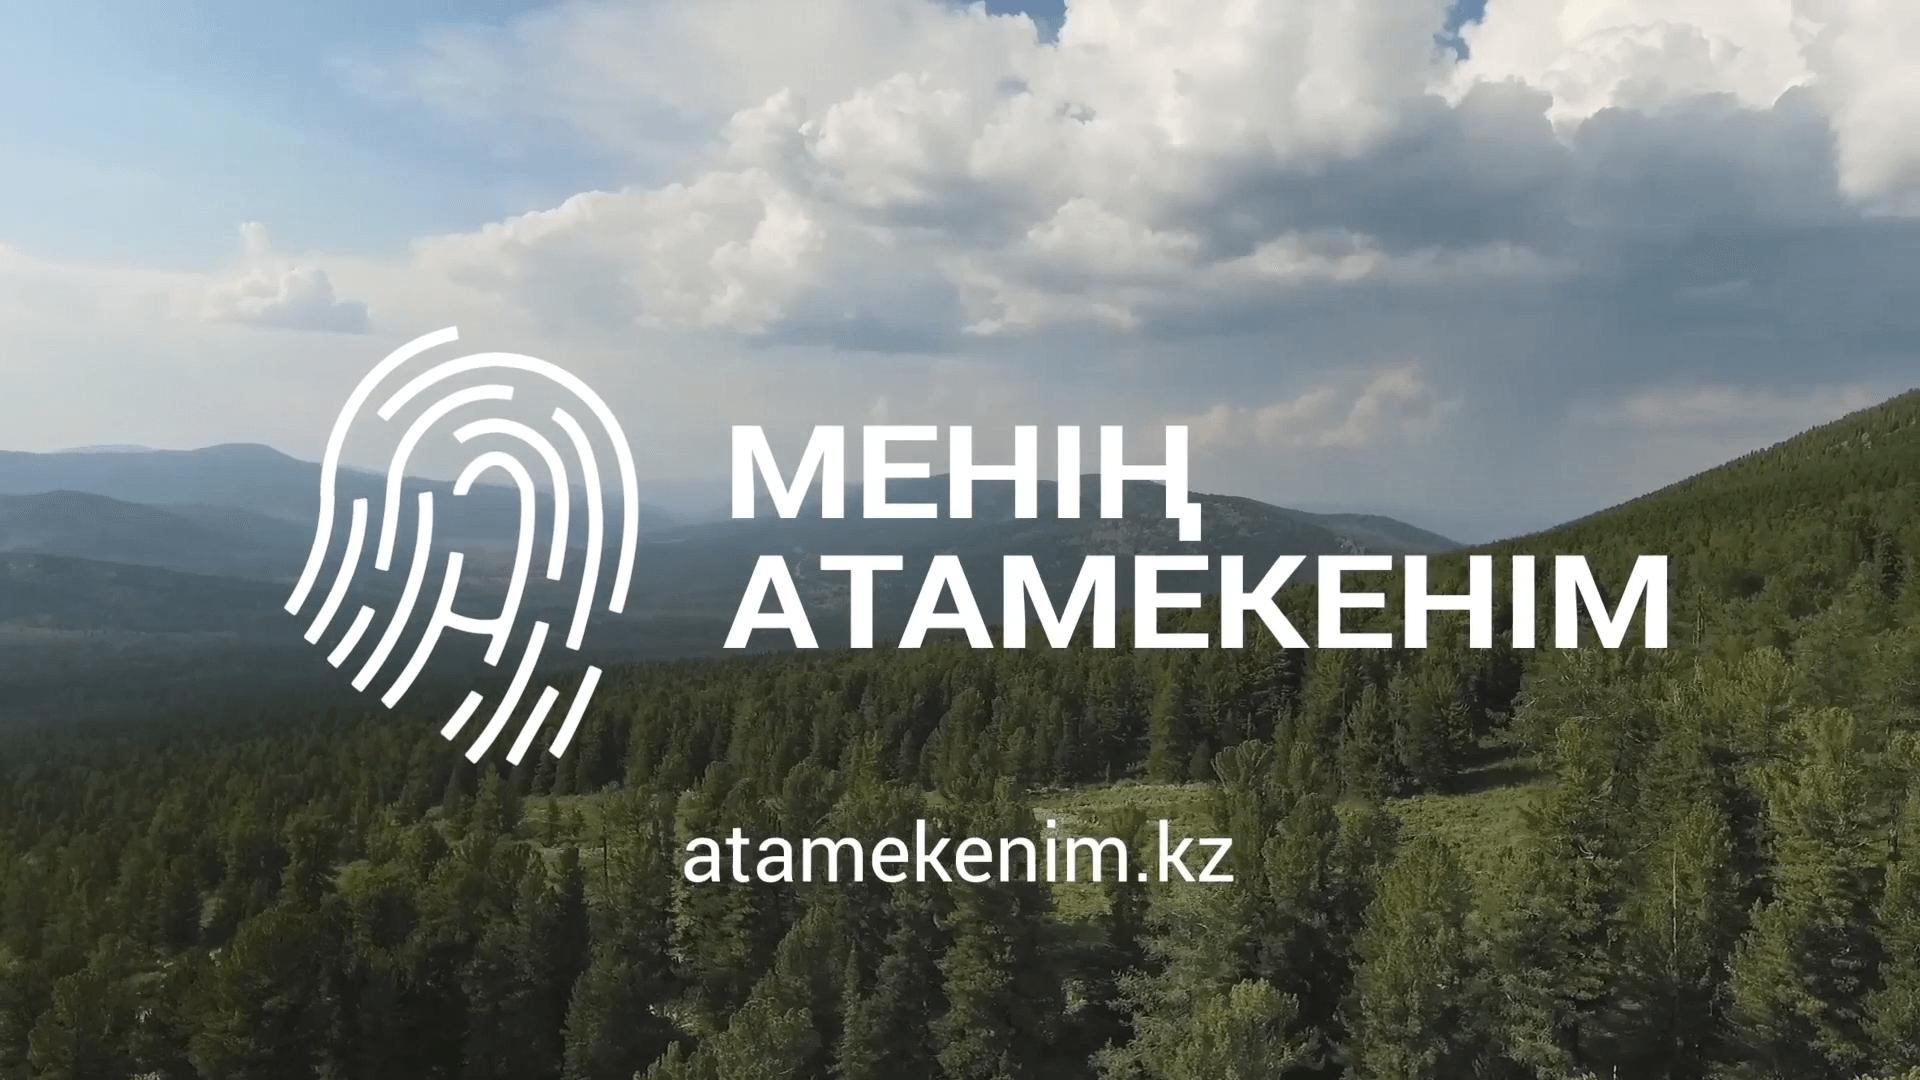 https://inbusiness.kz/ru/images/medium/9/images/5yvWyyJt.png